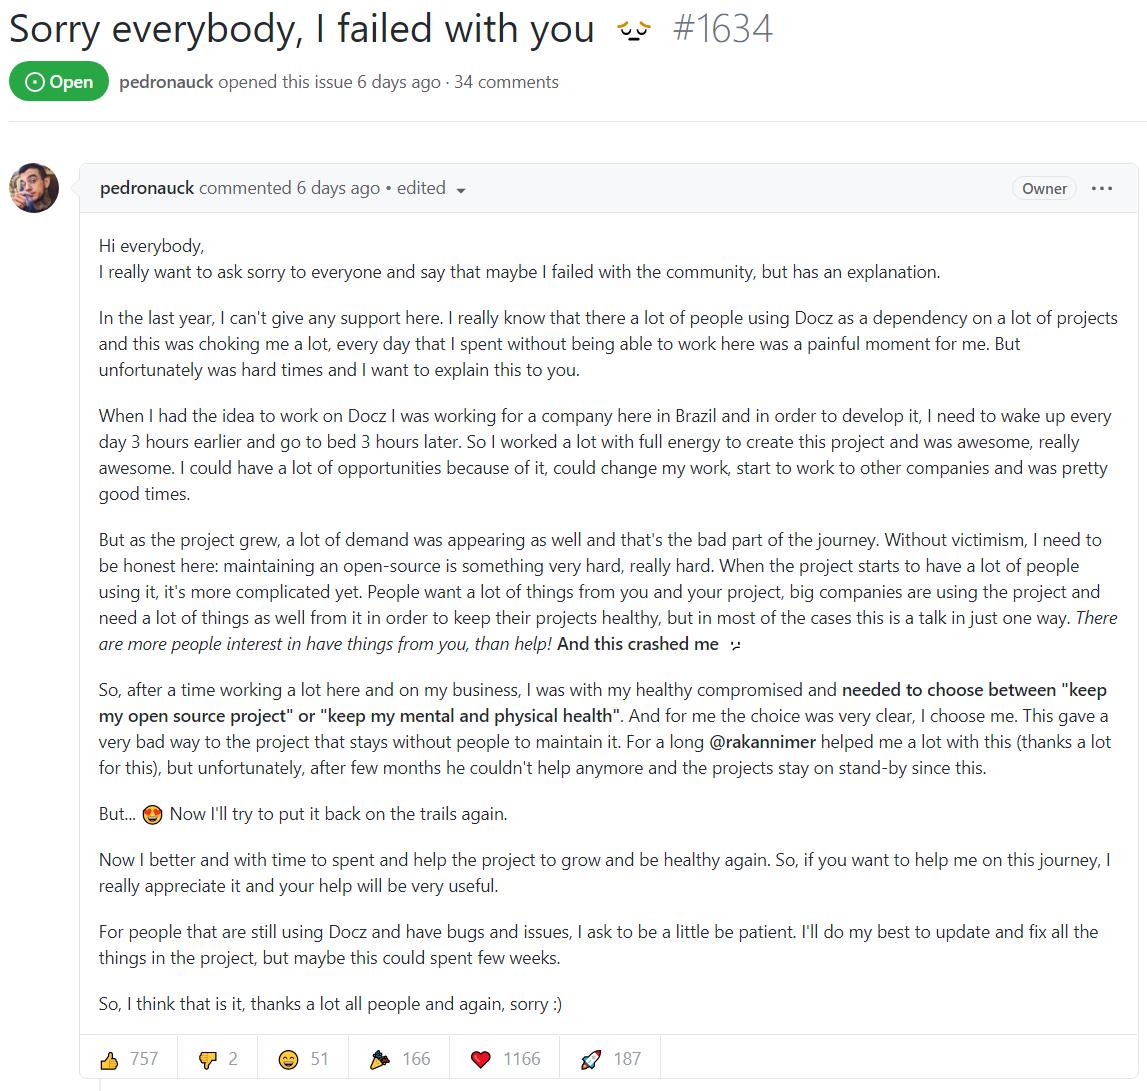 Redis 作者谈如何处理维护开源项目面对的精神压力